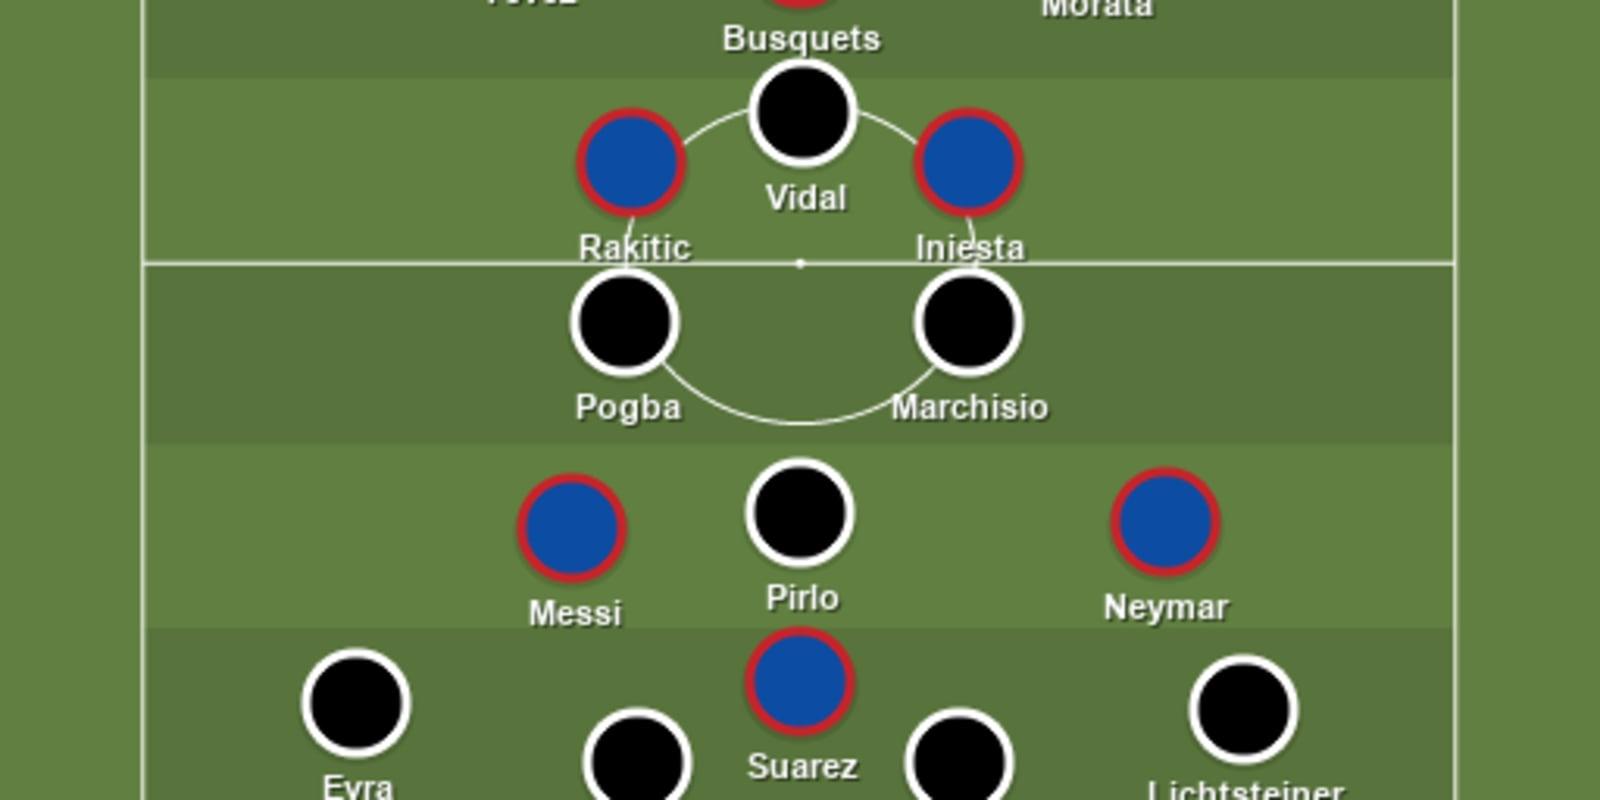 juventus vs barcelona 2015 champions league final preview juventus vs barcelona 2015 champions